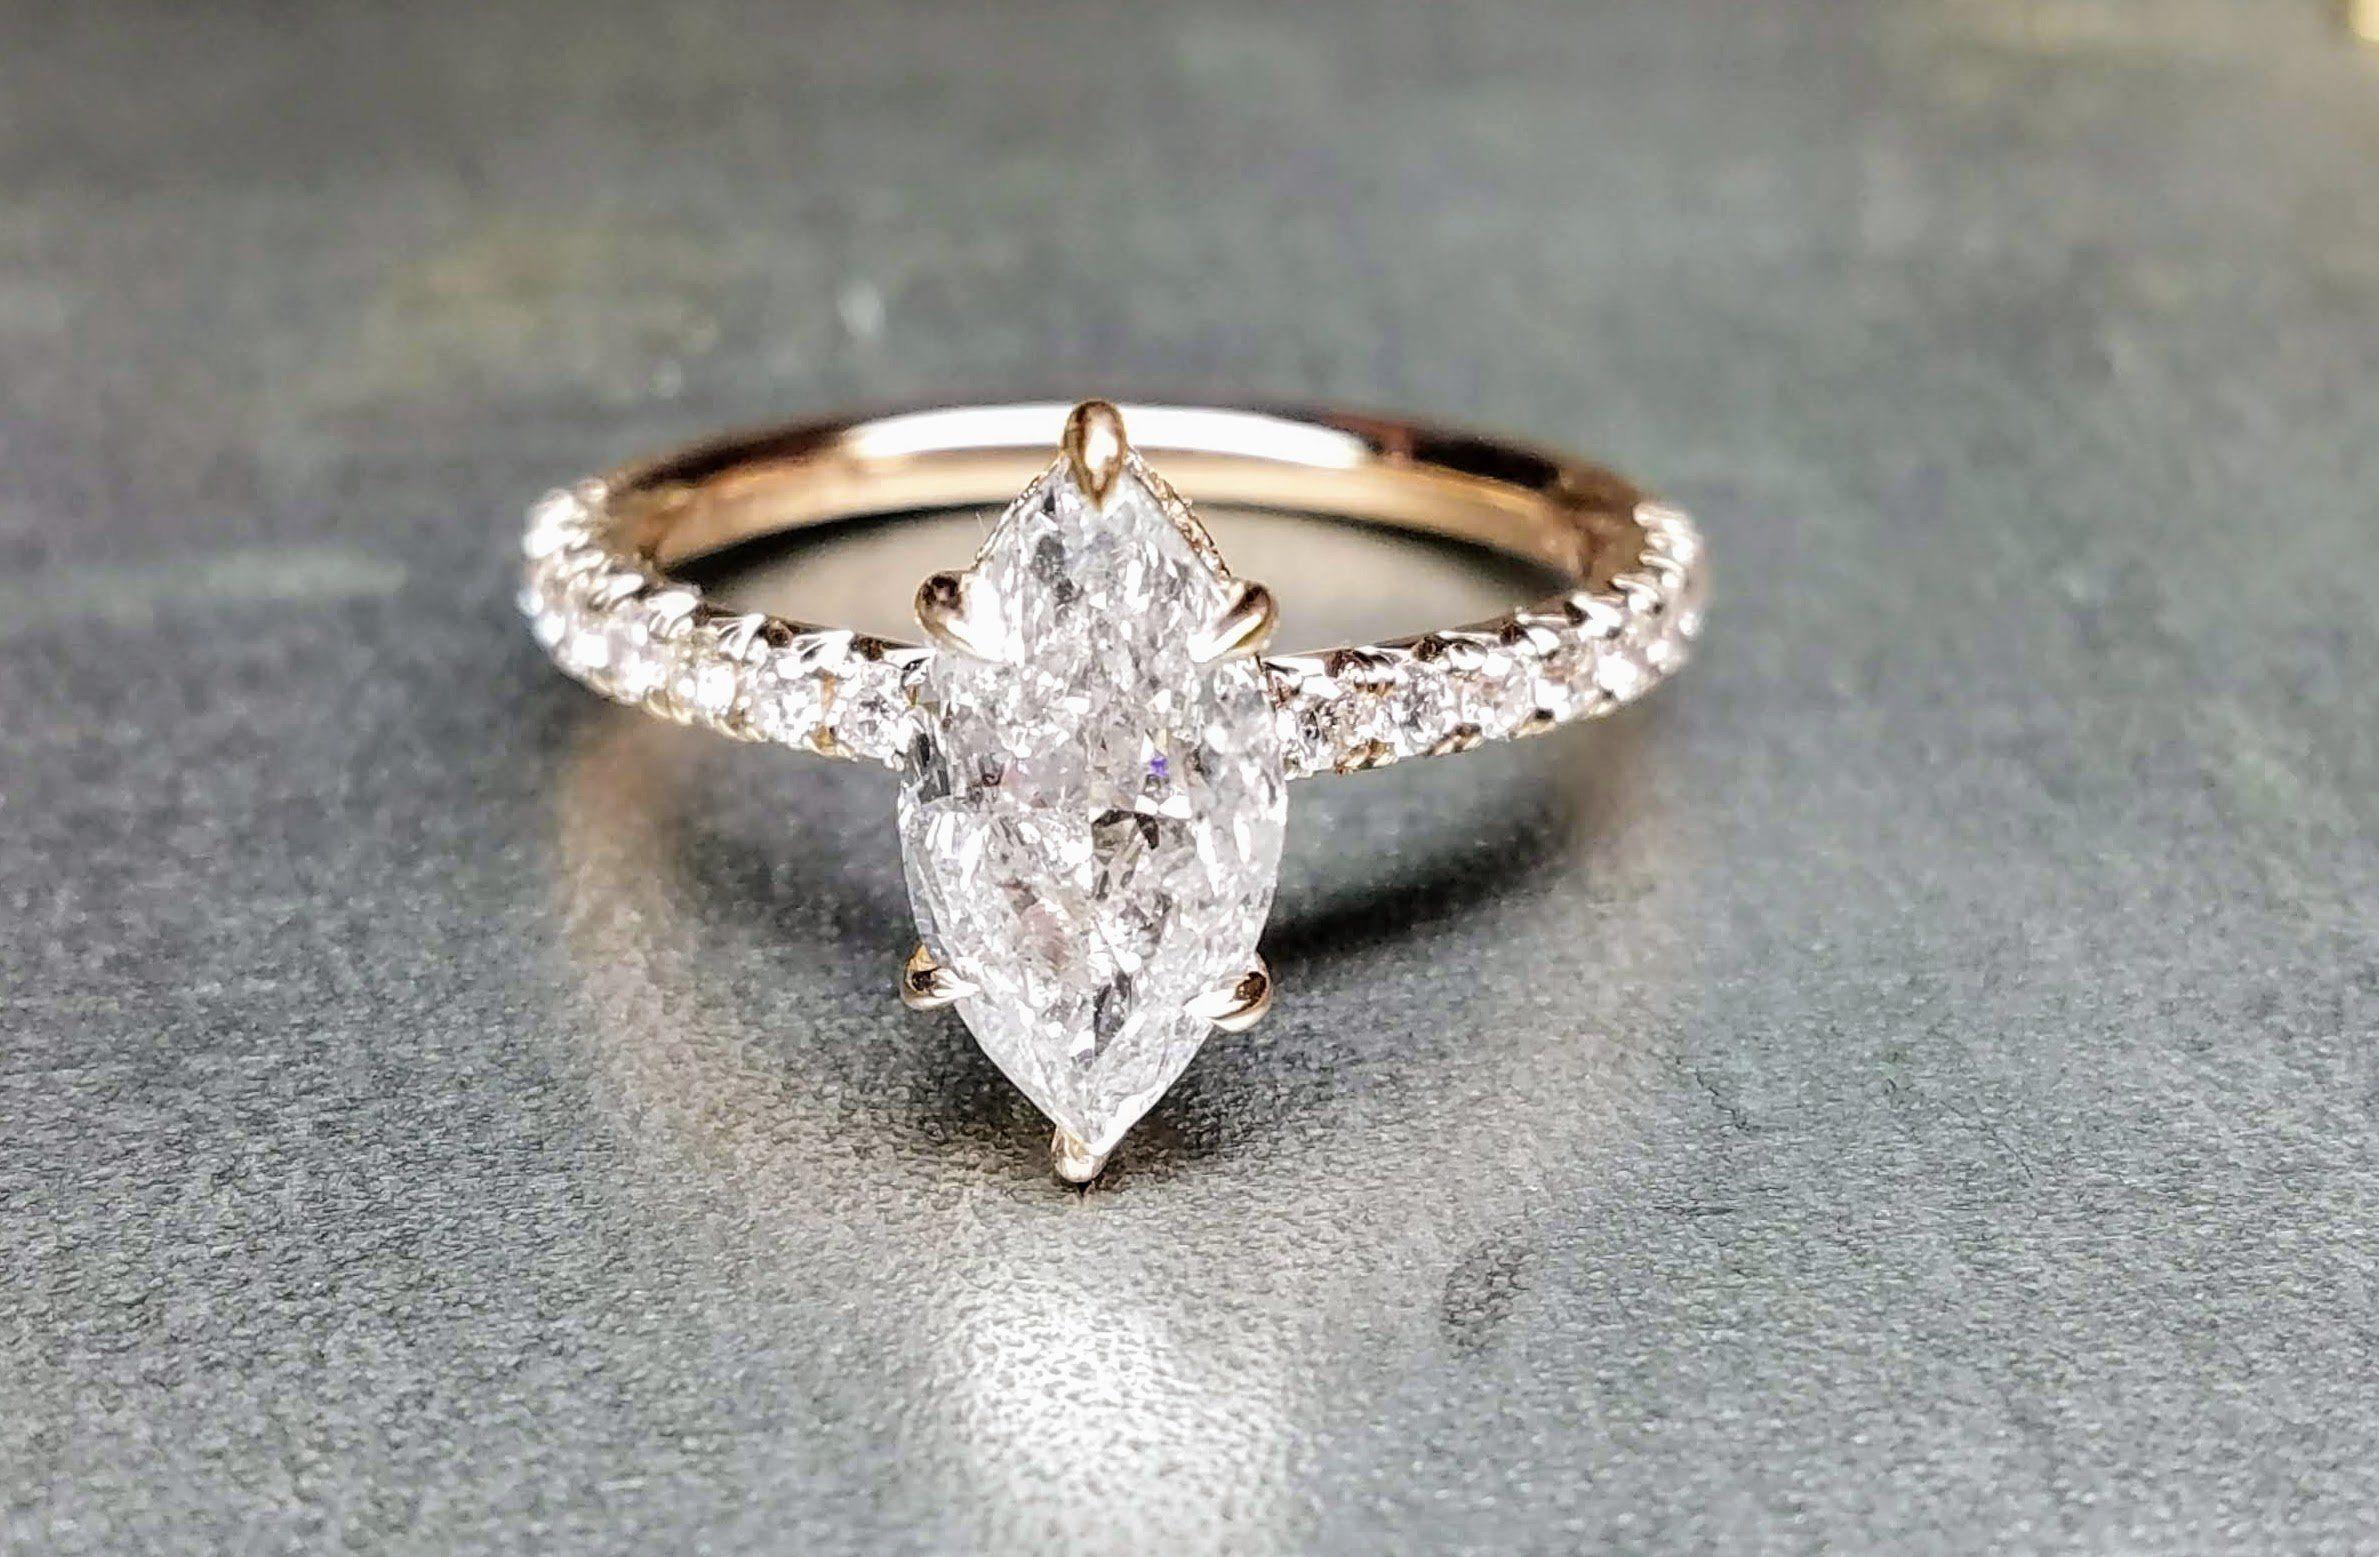 Diamond marquise 1.50 carat rose gold engagement ring